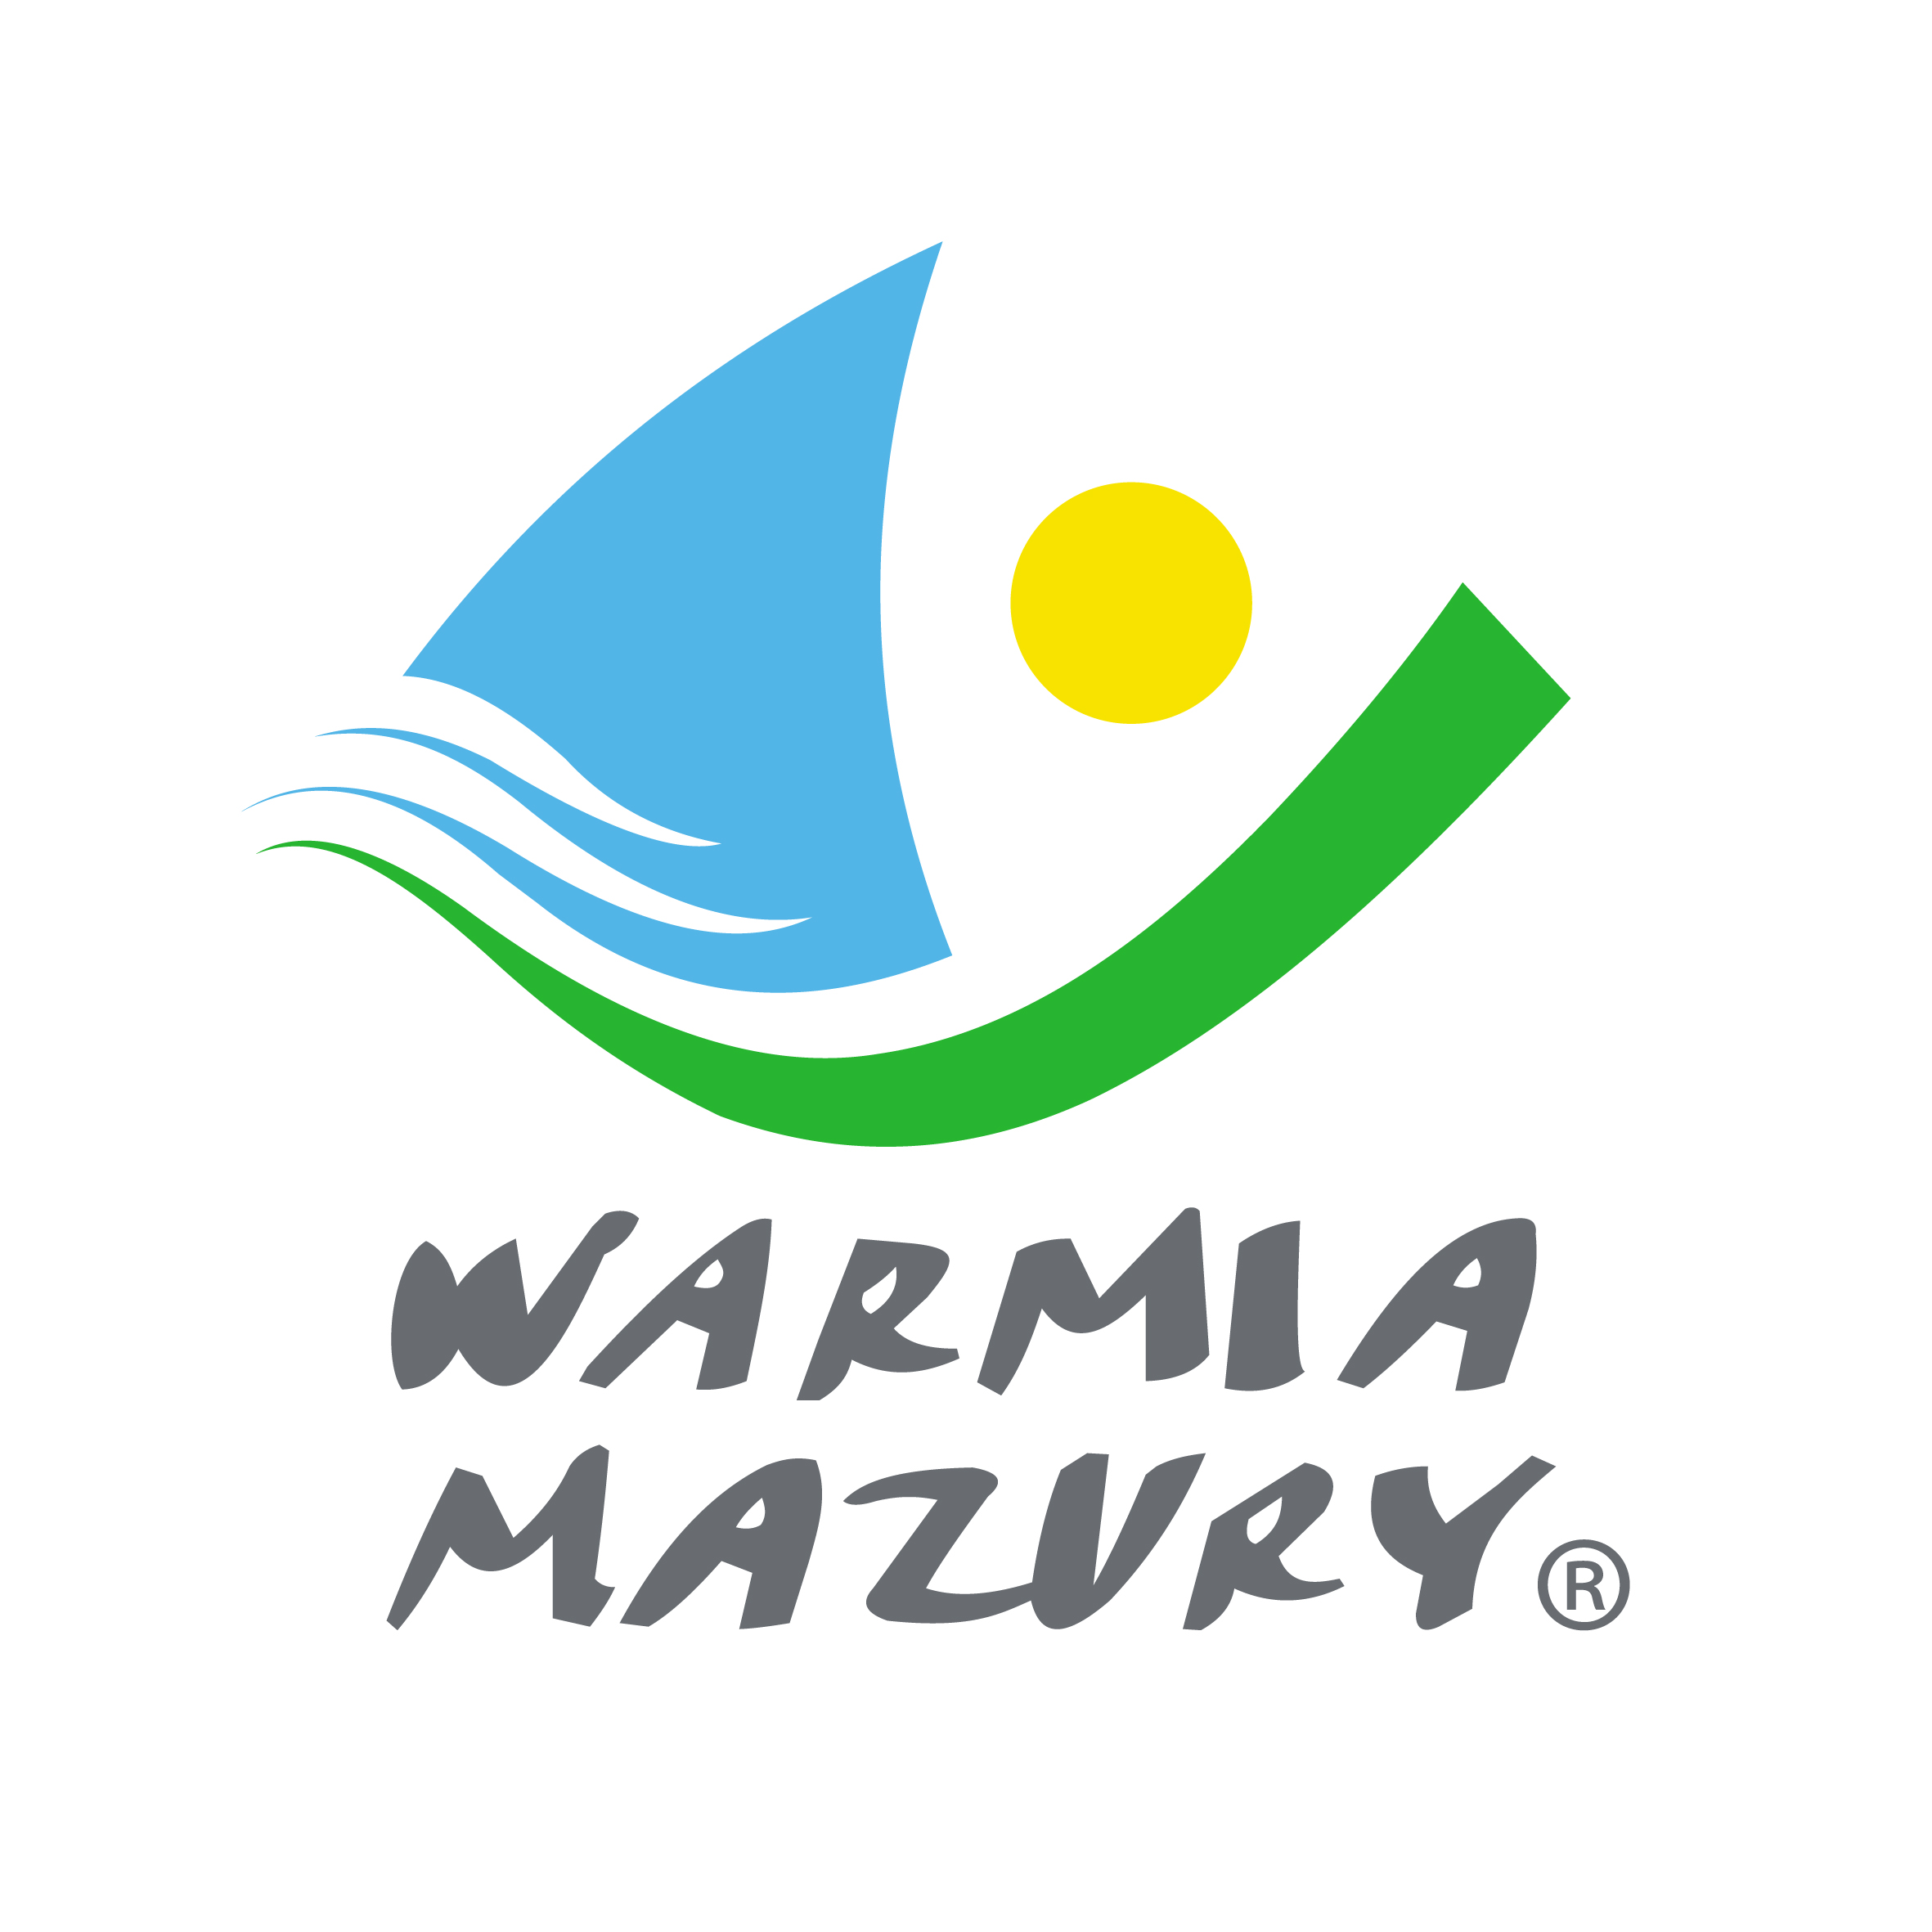 warmia_mazury LOGO.eps